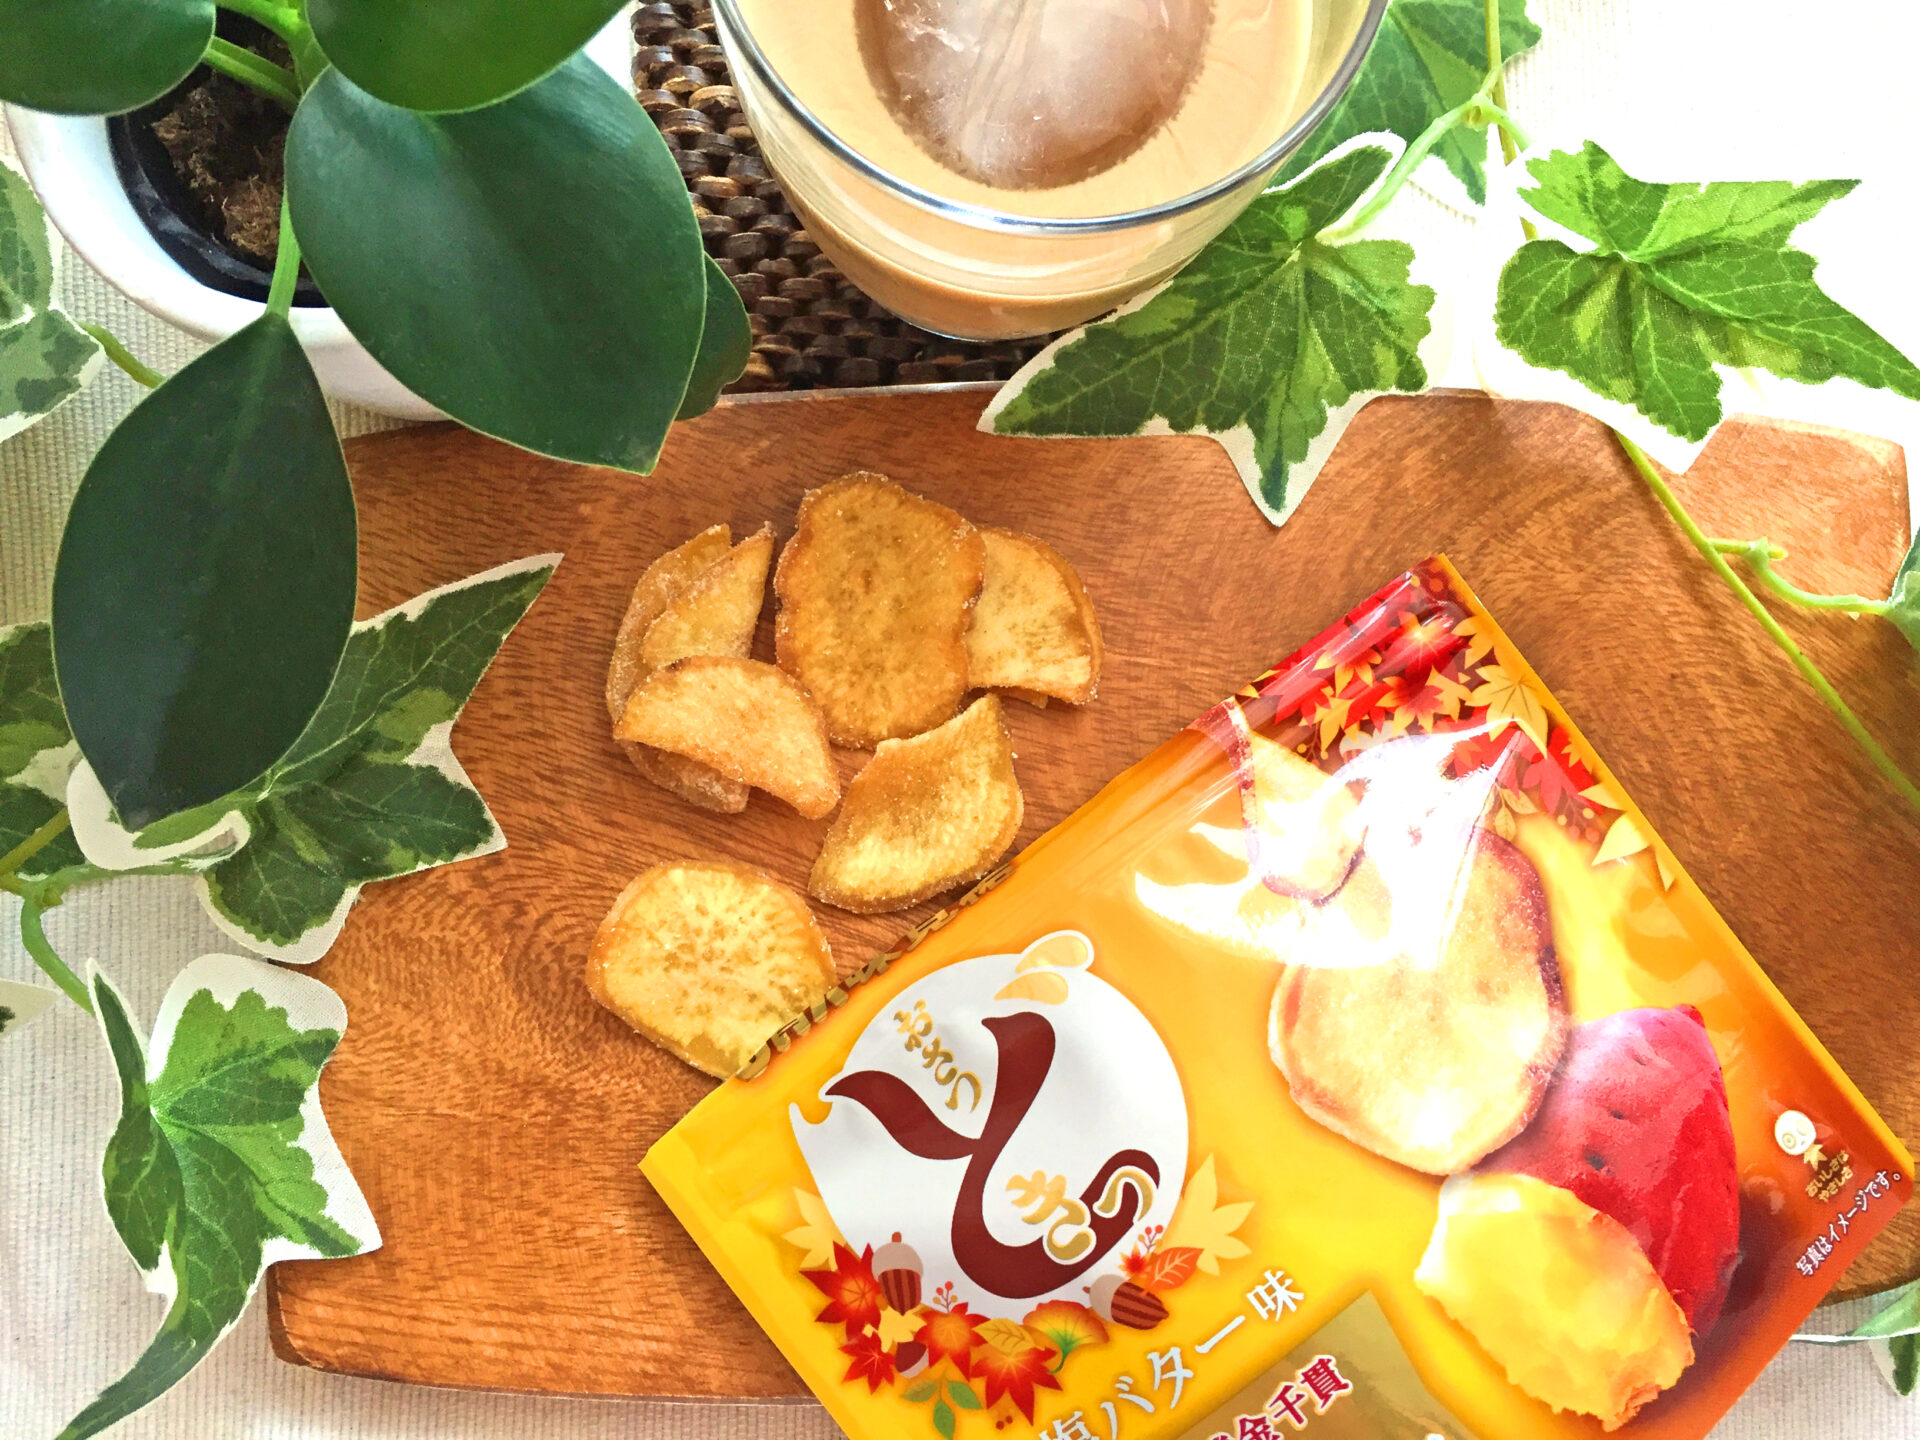 UHA味覚糖『おさつどきっ 塩バタースタンドパック』